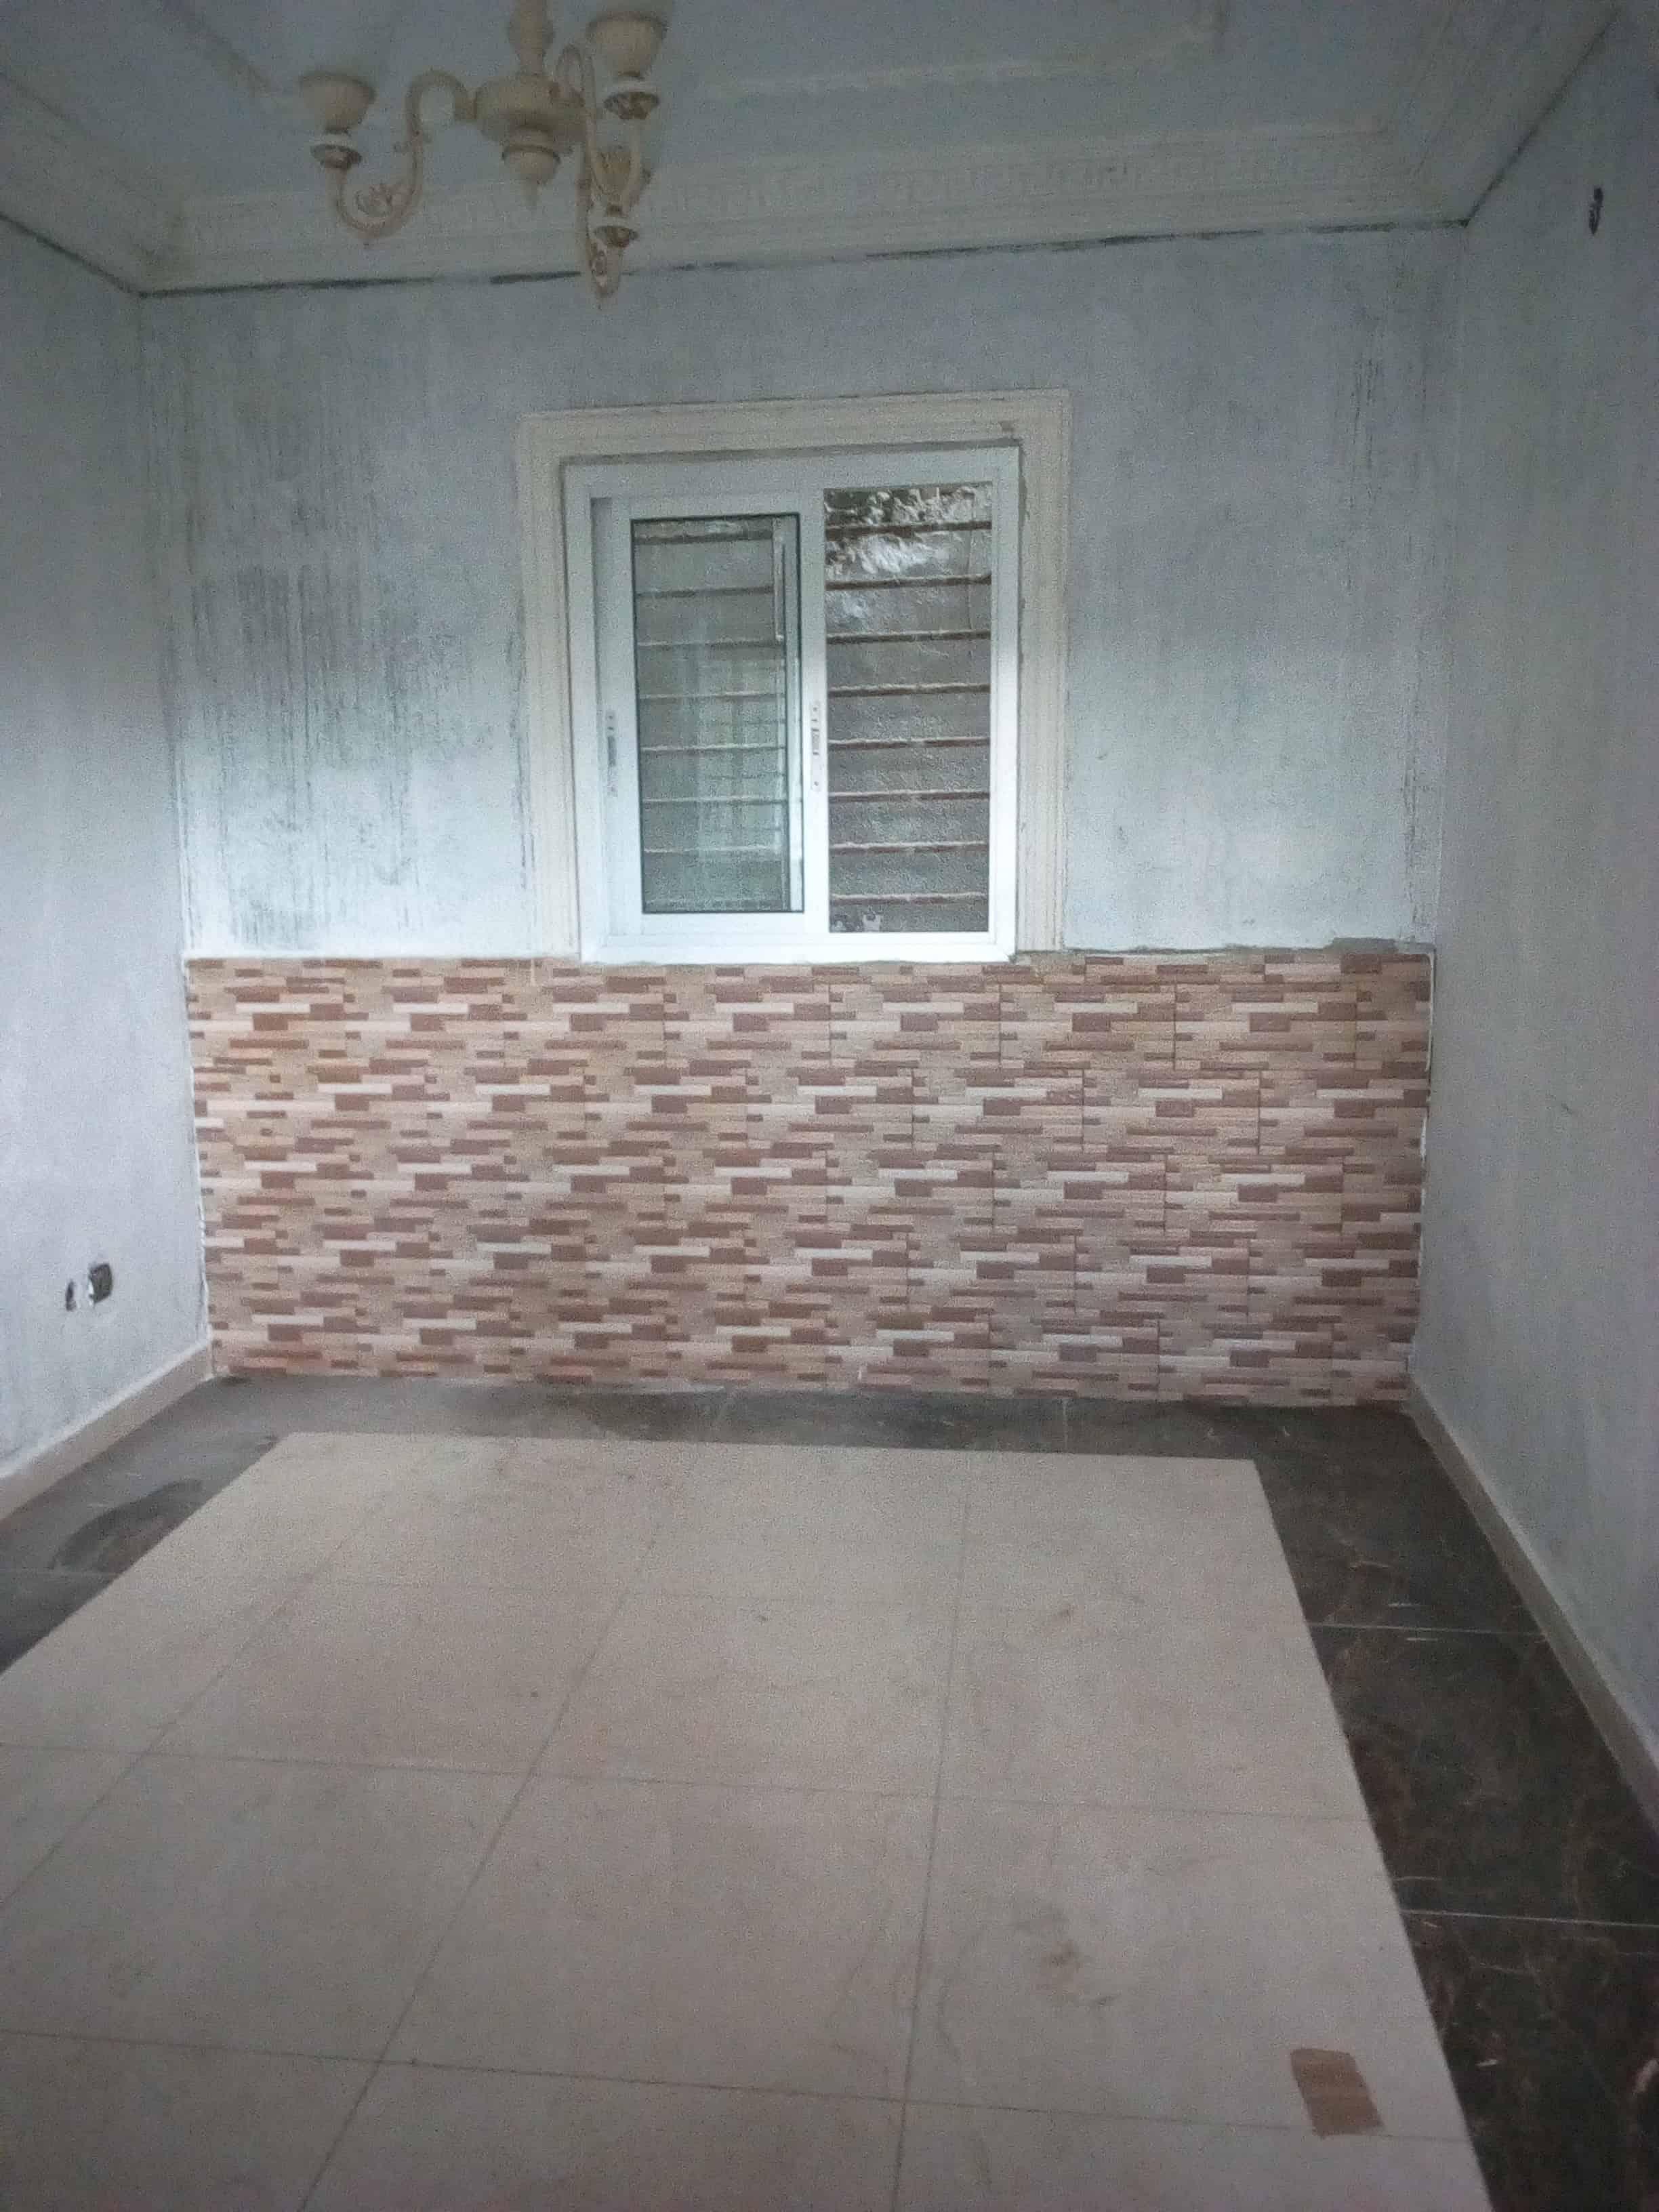 Studio to rent - Douala, Logpom, Basson - 40 000 FCFA / month